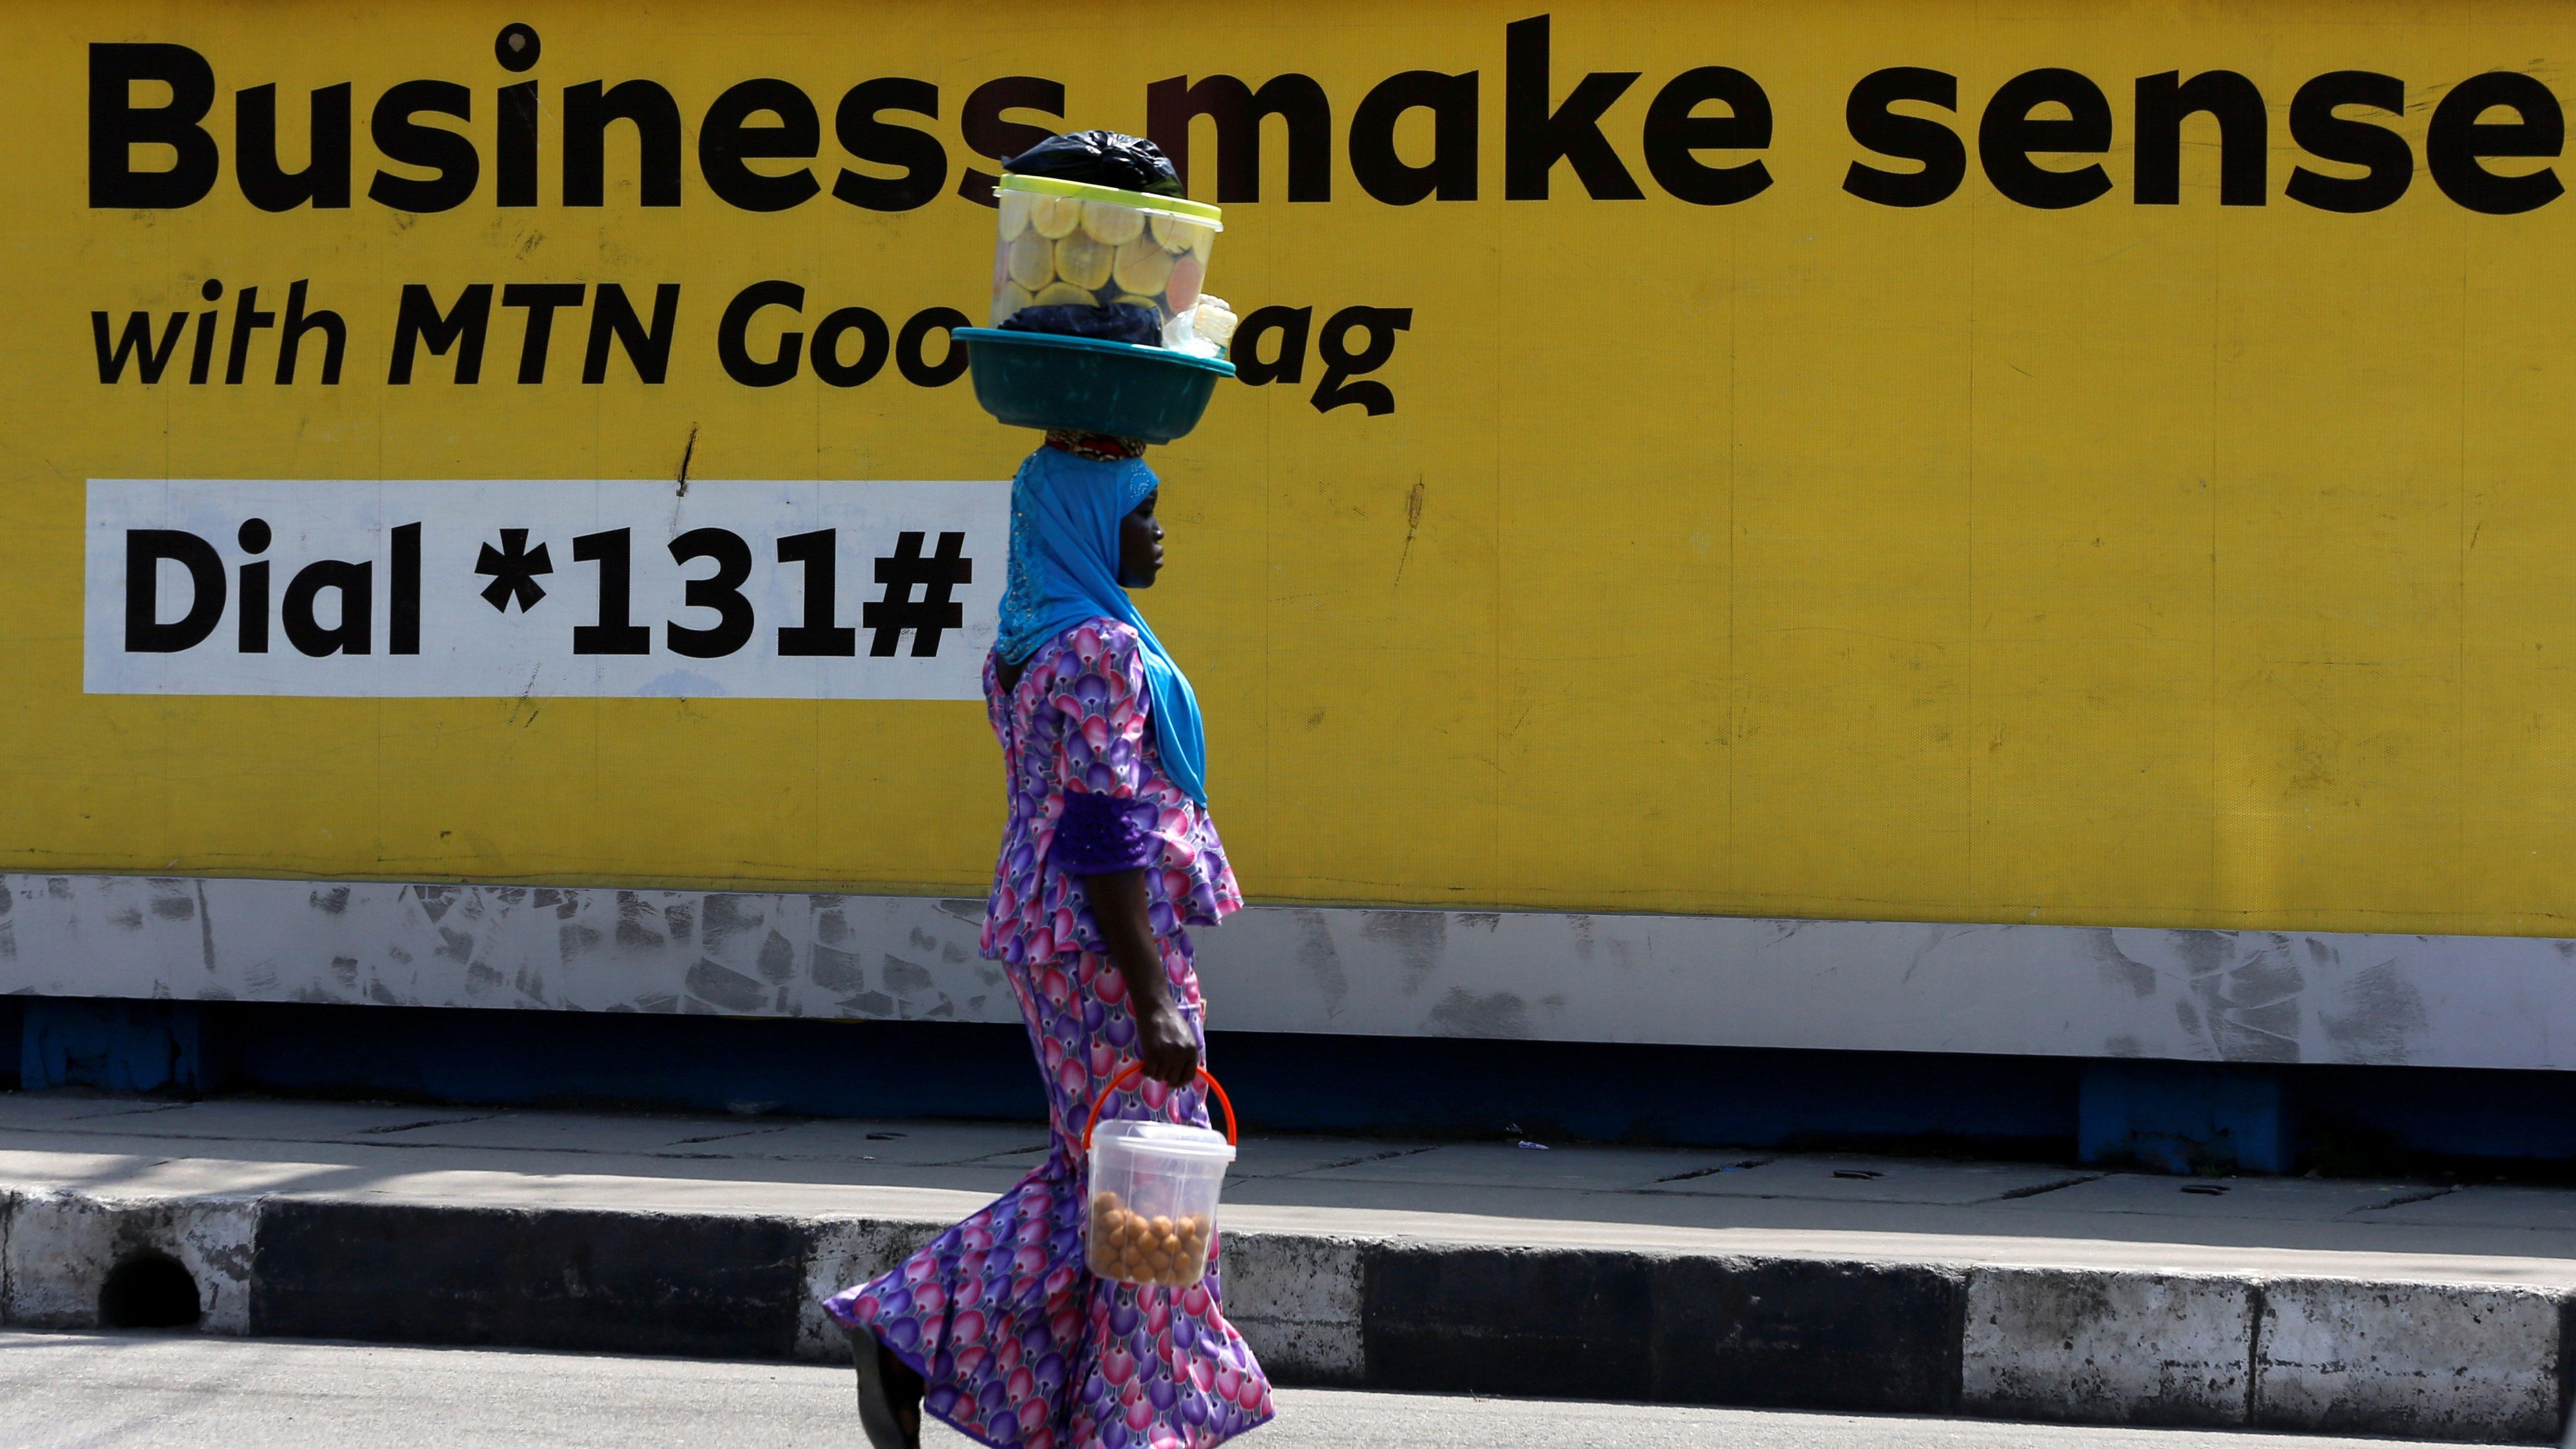 Nigeria can attract foreign investment despite MTN, HSBC — Quartz Africa